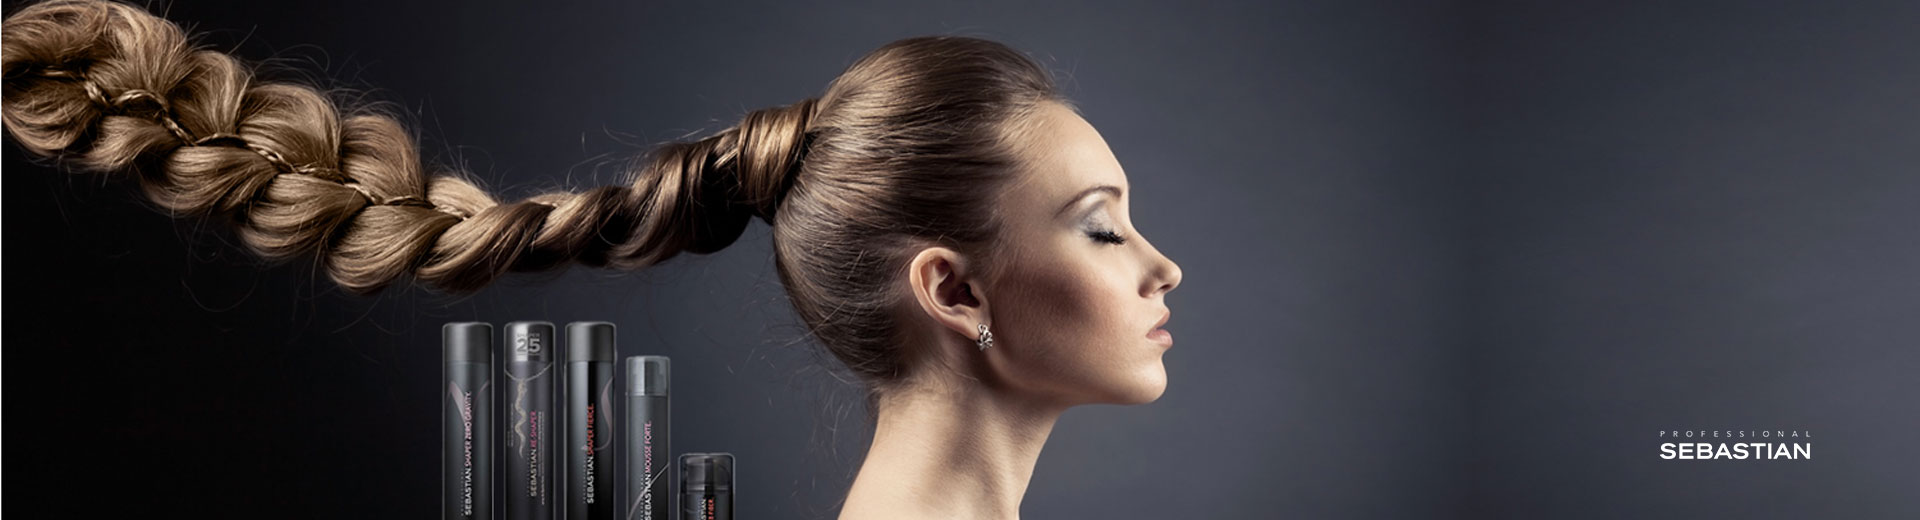 Sebastian Professional - Shampoo. Haarpflege. Styling